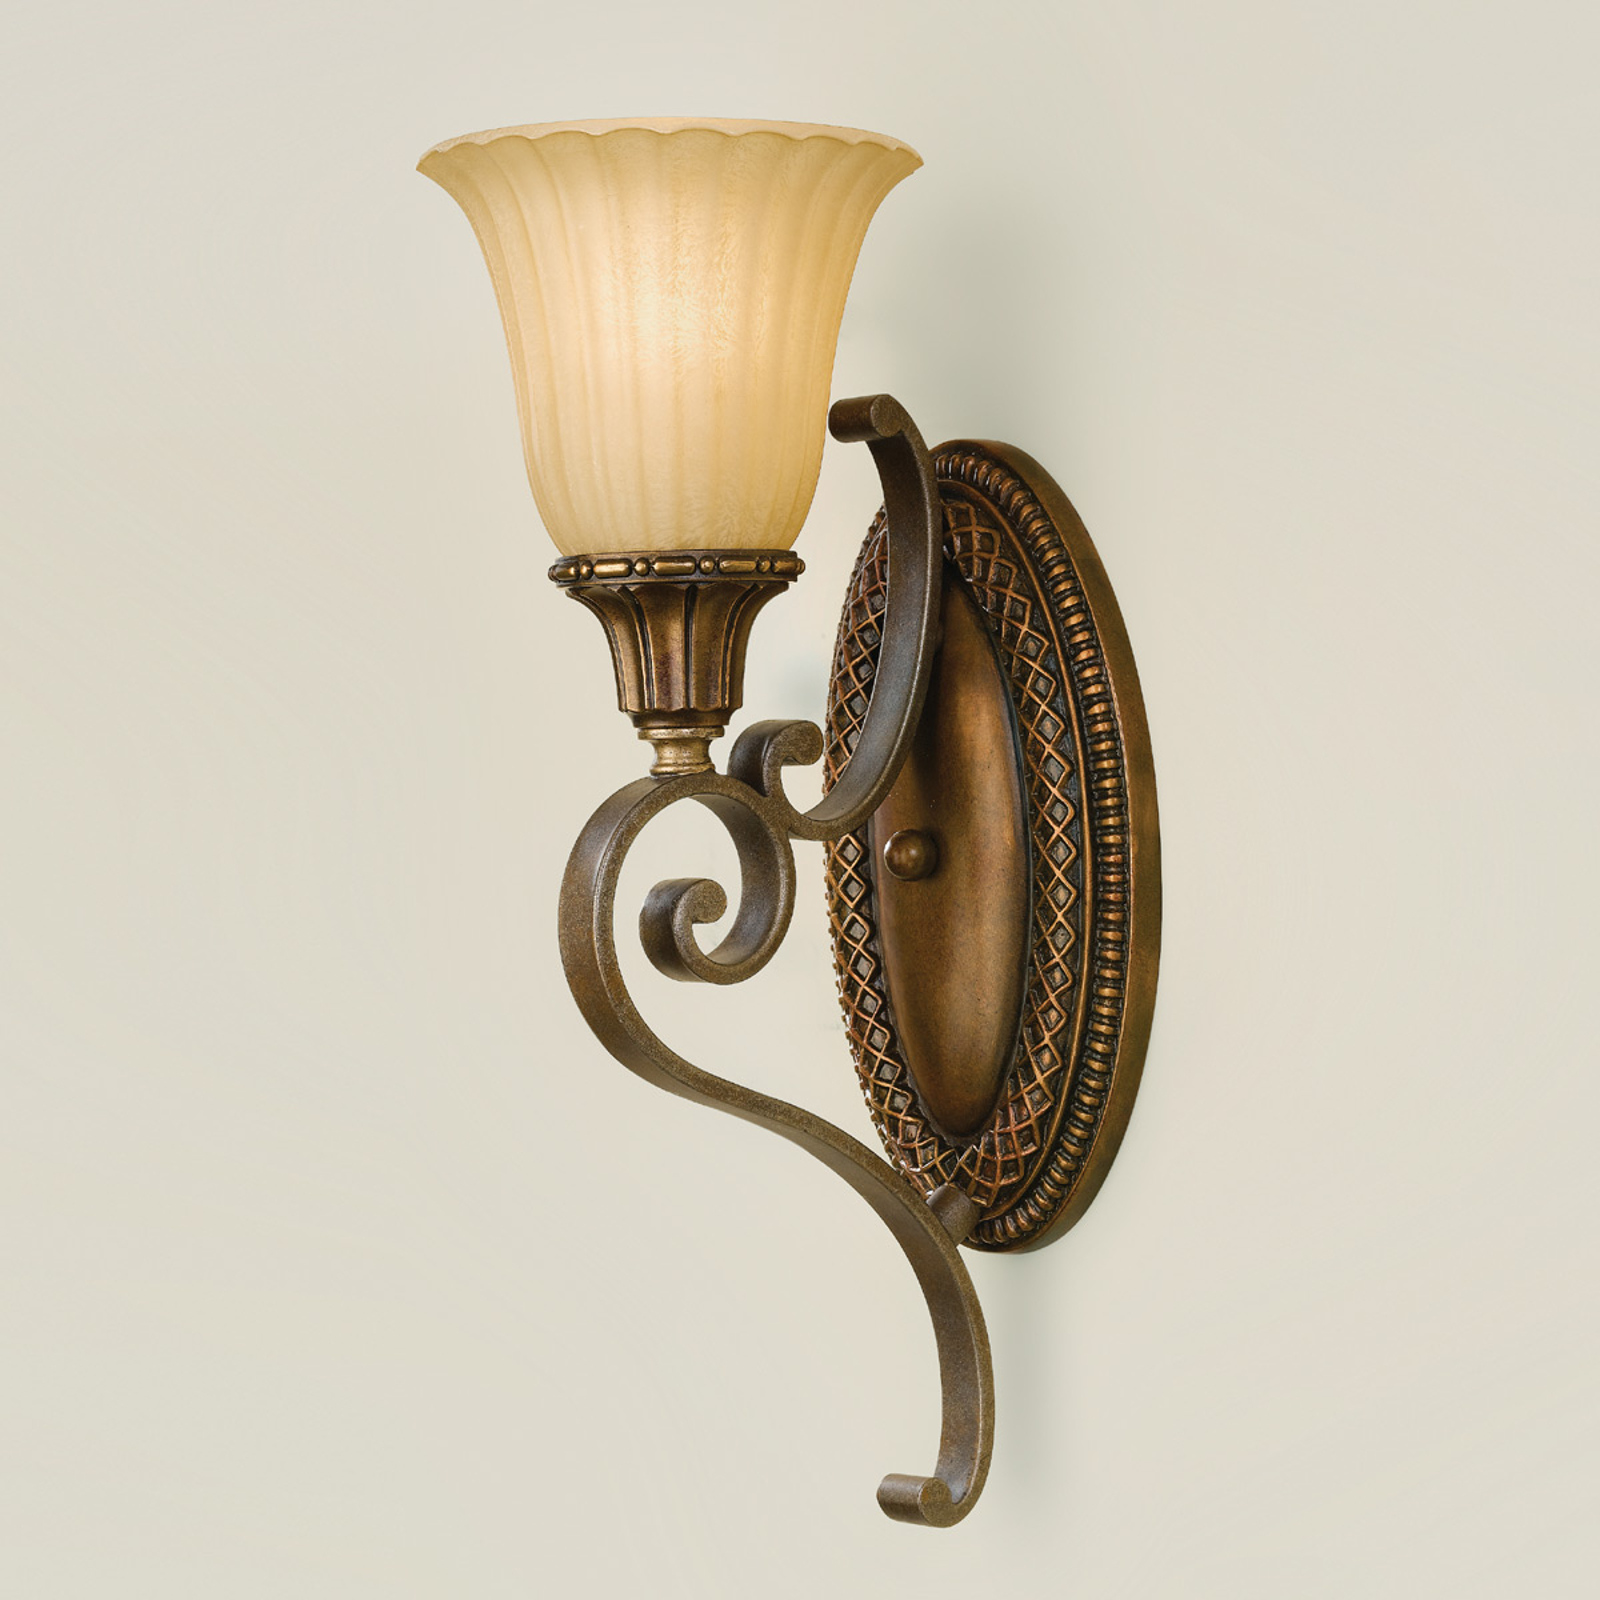 Kelham Hall Wall Light Bronze / Gold_3048080_1